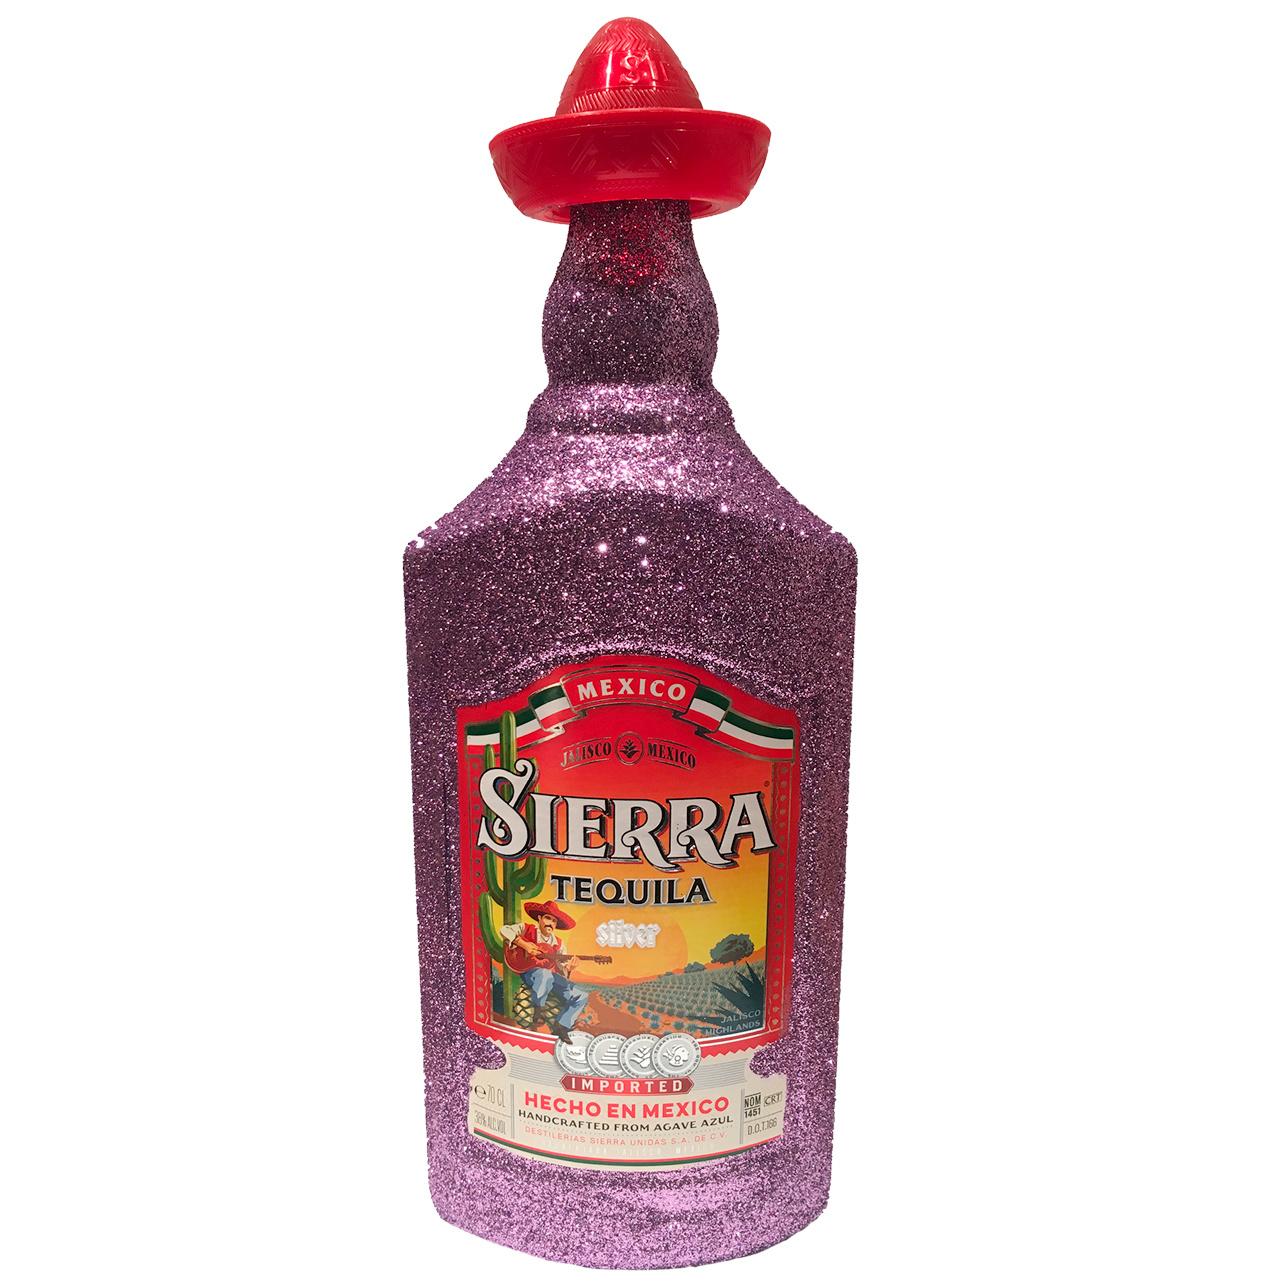 Spezial Brands Glitzer Sierra Tequila (0,7l)